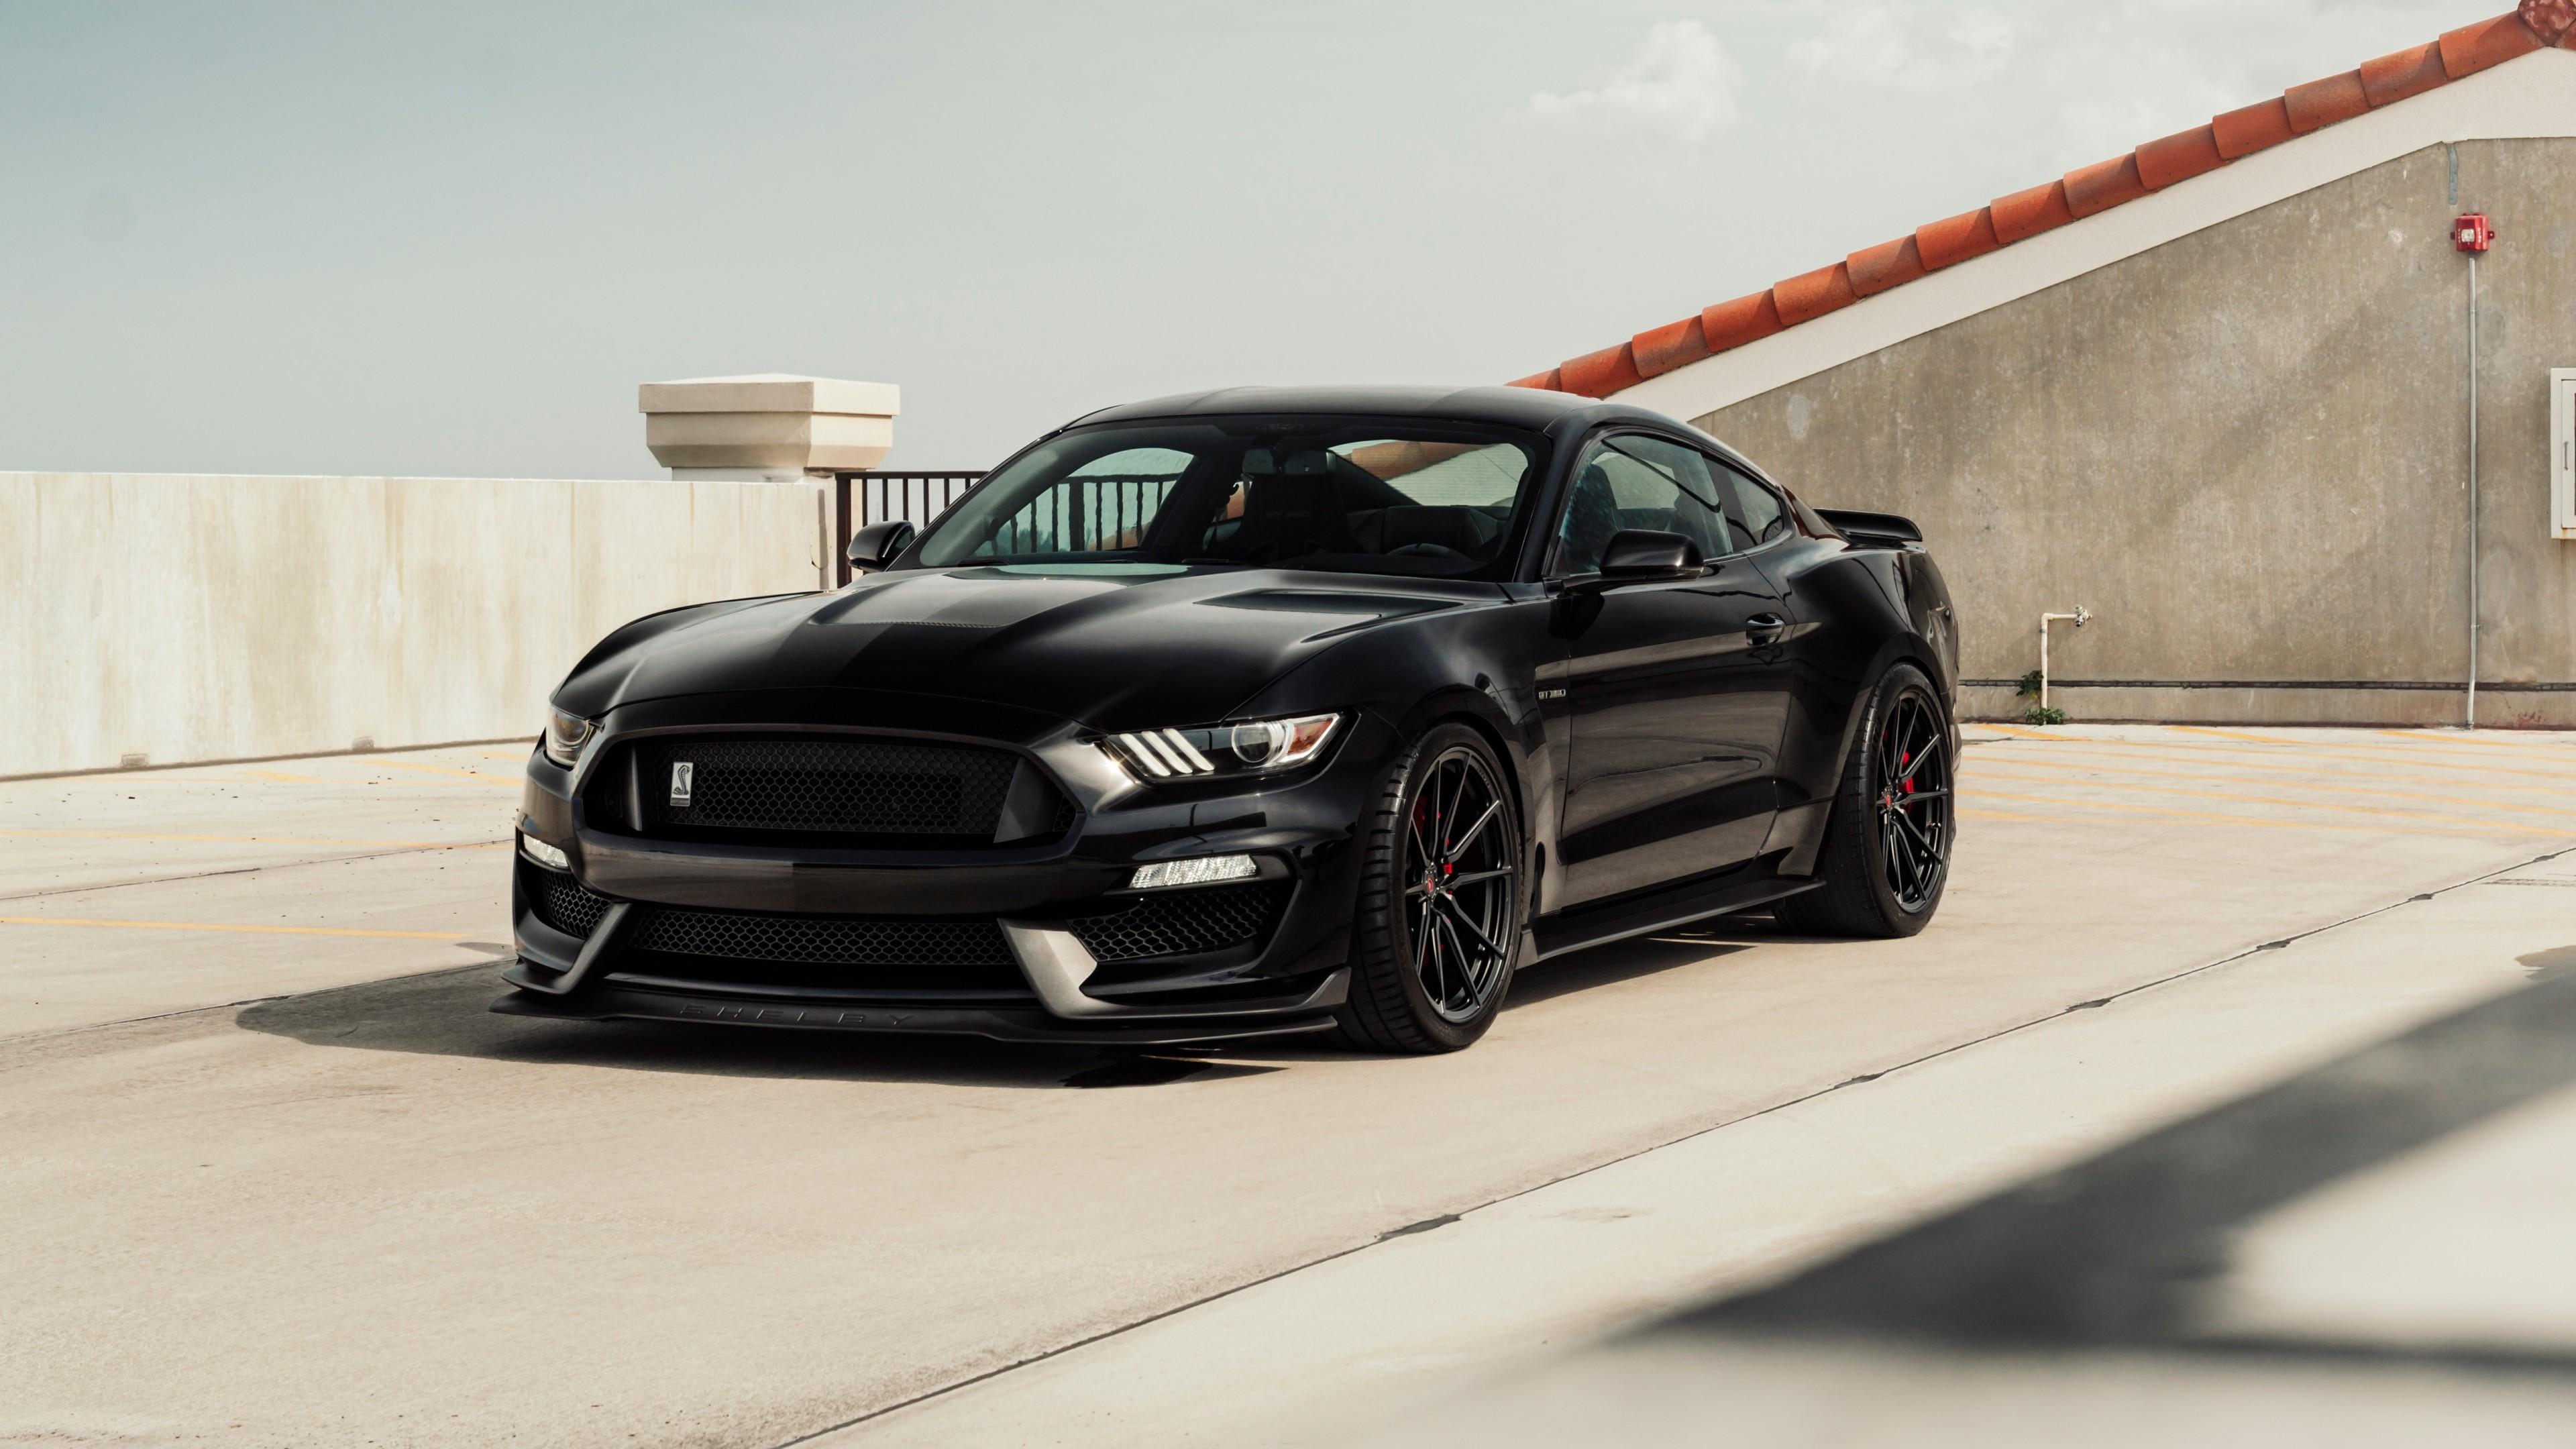 Black Ford Mustang 5k Wallpaper Hd Car Wallpapers Id 10951